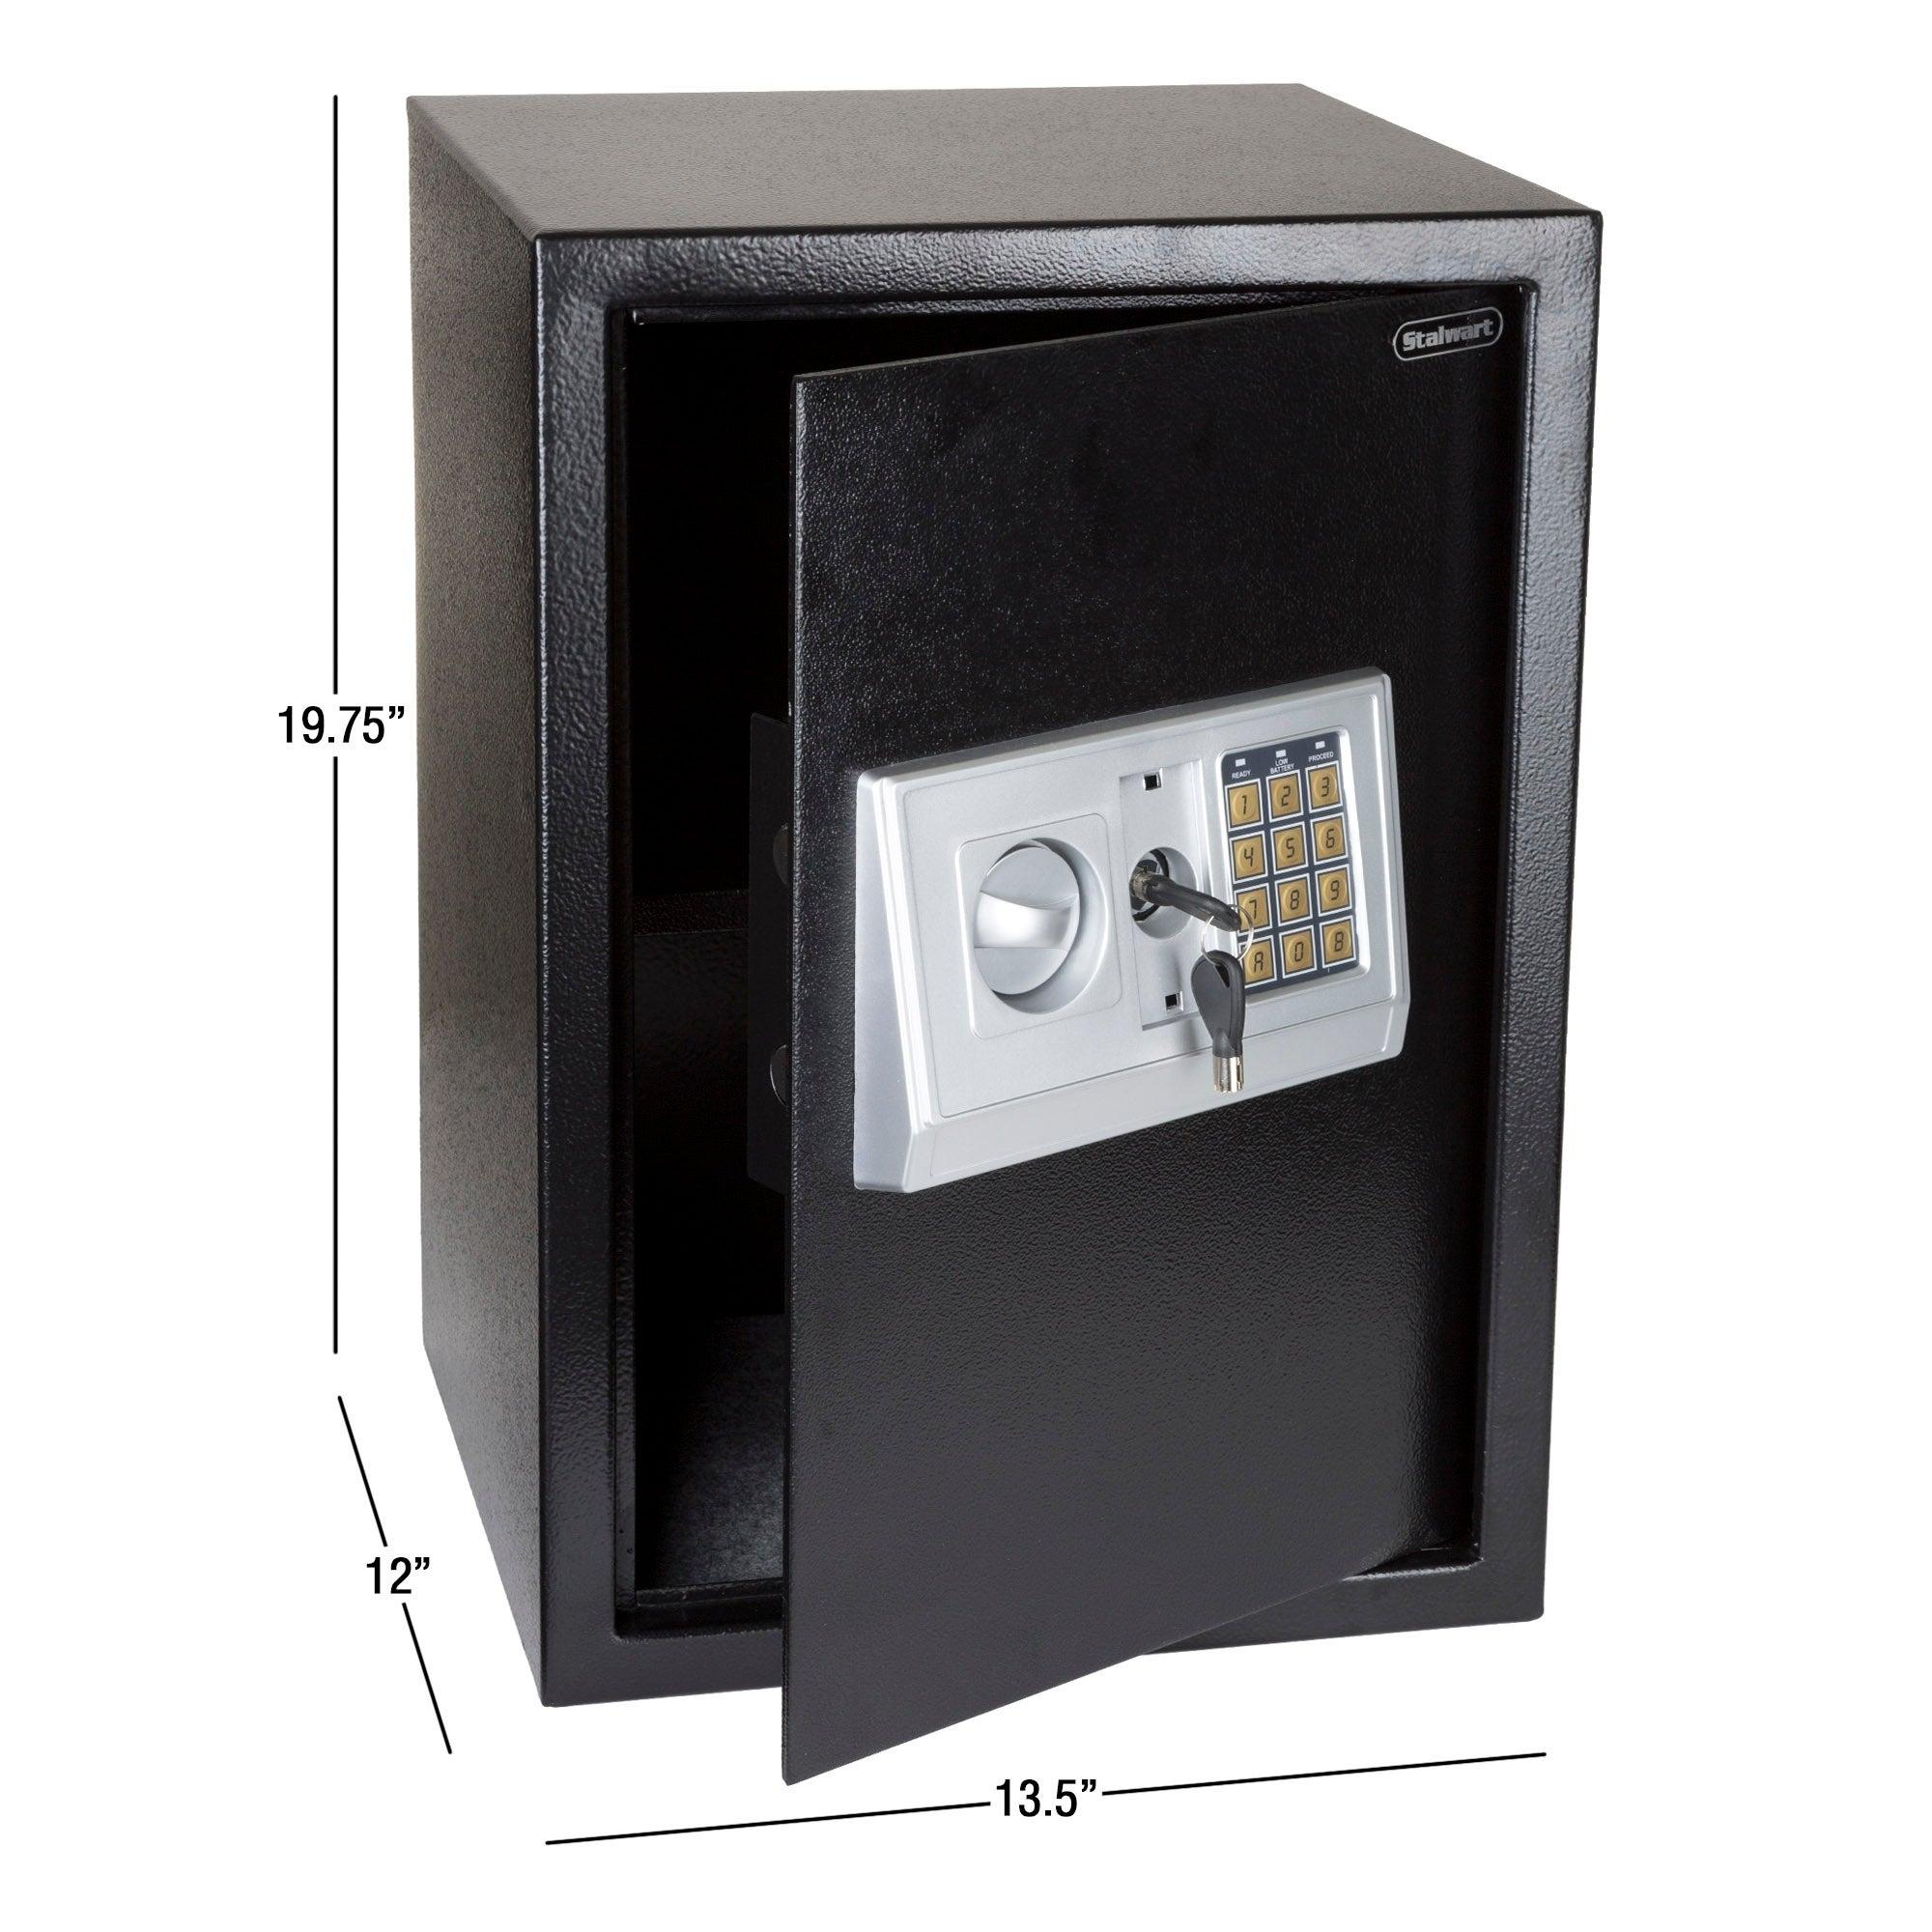 Large Heavy Duty Fireproof Digital Safe Box Gun Cash Jewelry Home Office Secure